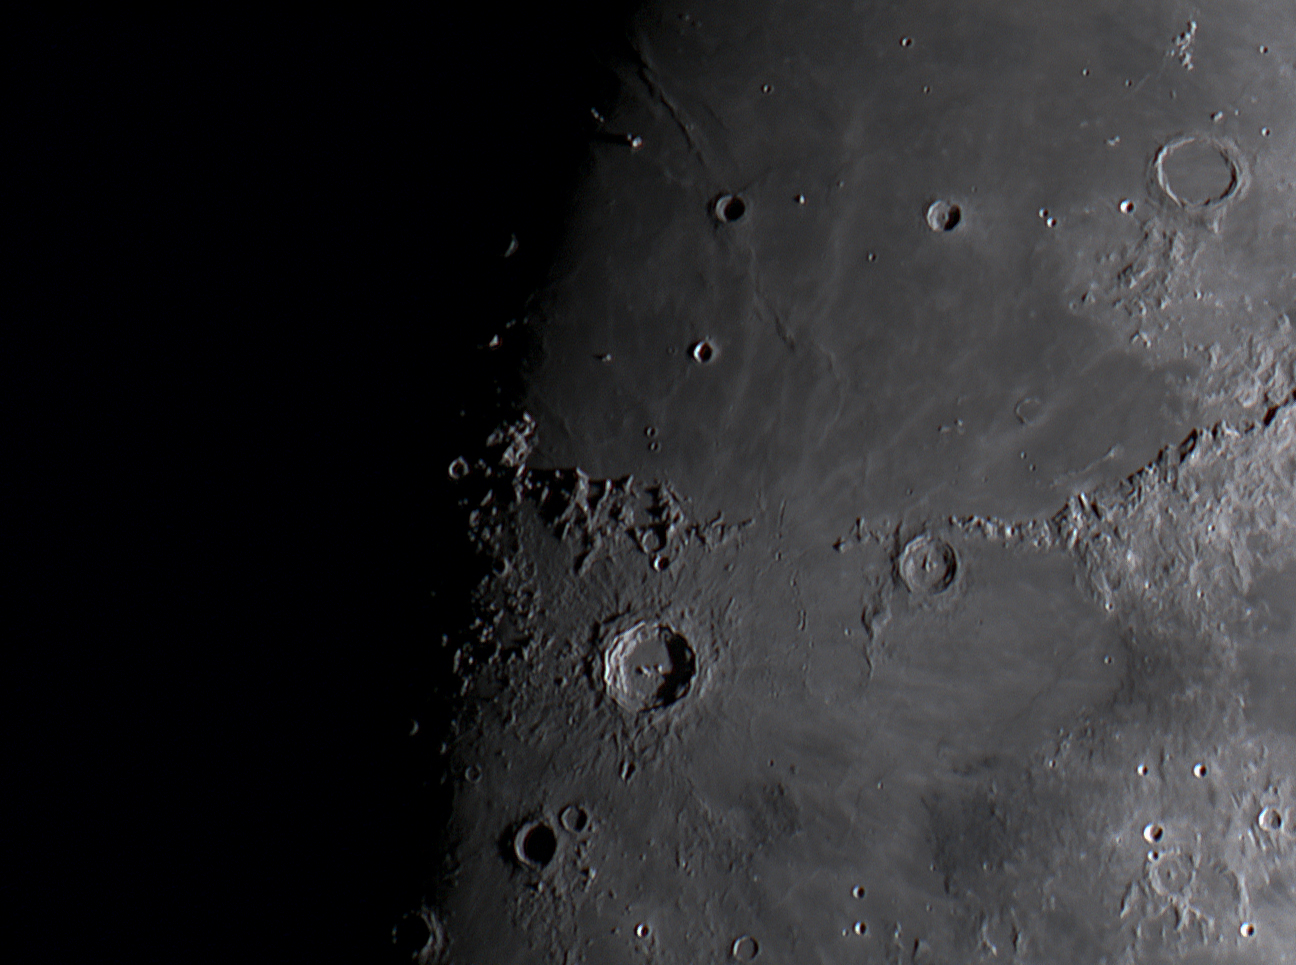 Moon_181904Kopernik_1BR.jpg